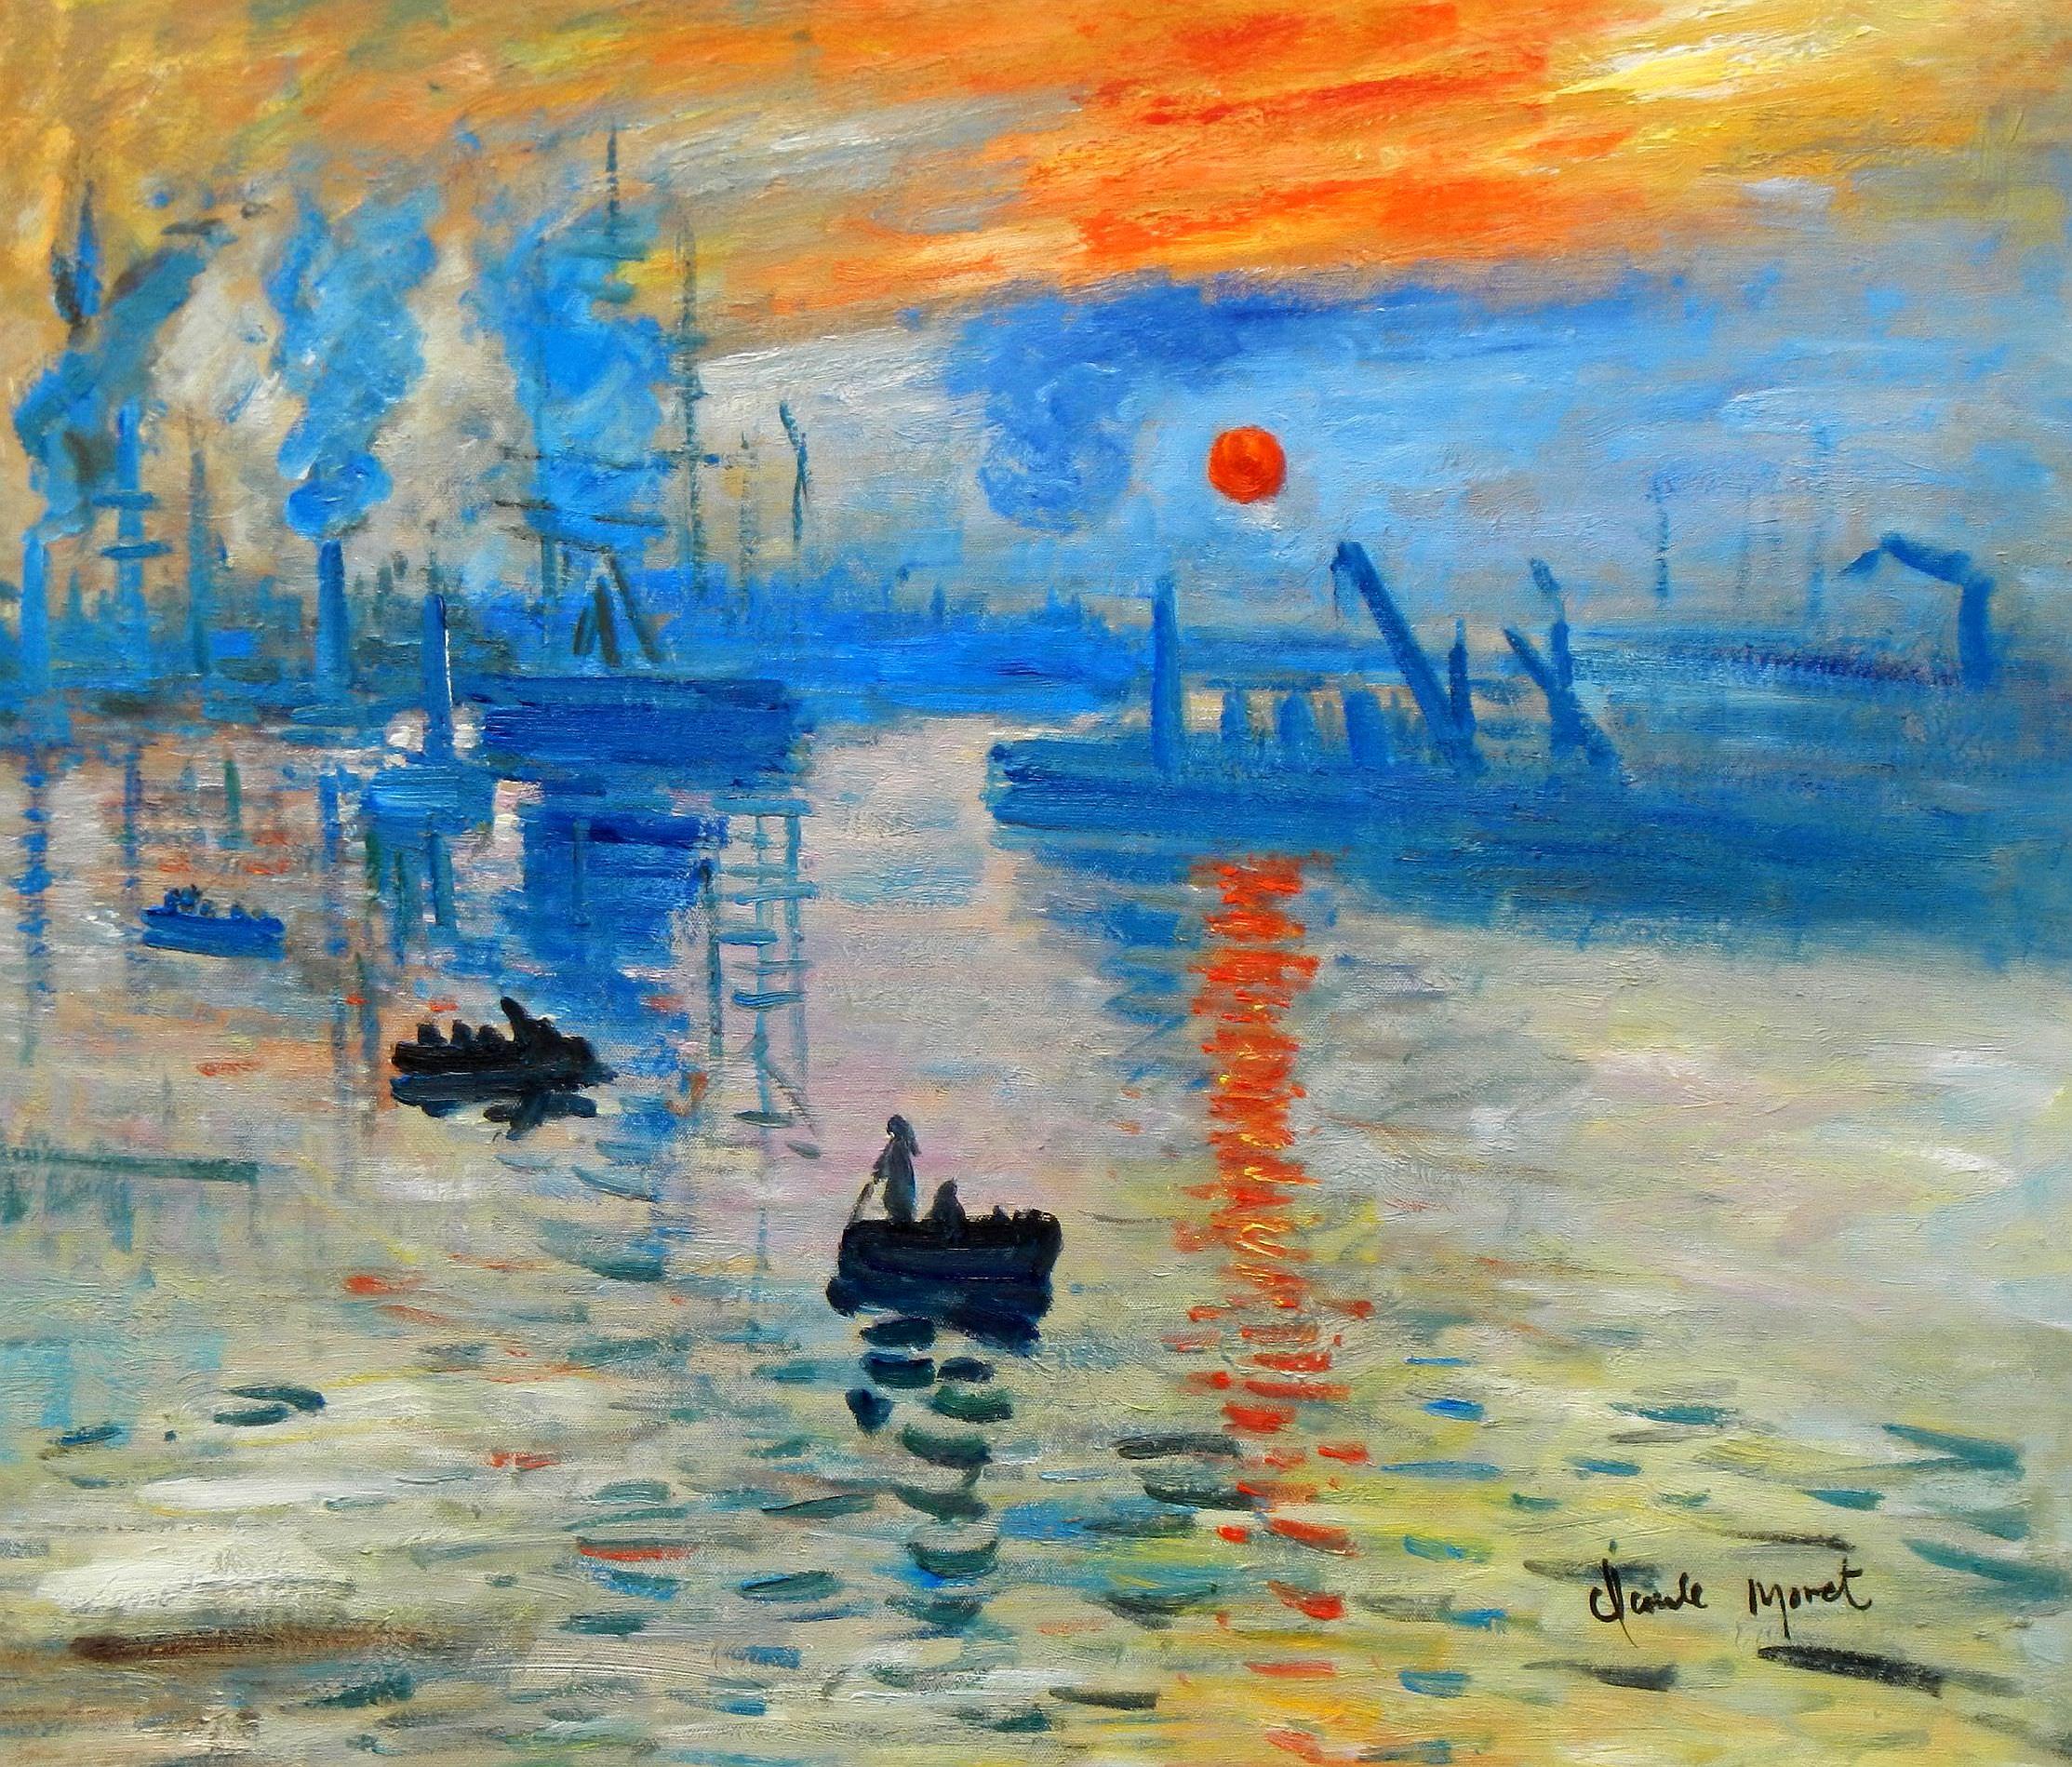 Claude Monet - Sonnenaufgang c93331 50x60cm Ölgemälde handgemalt